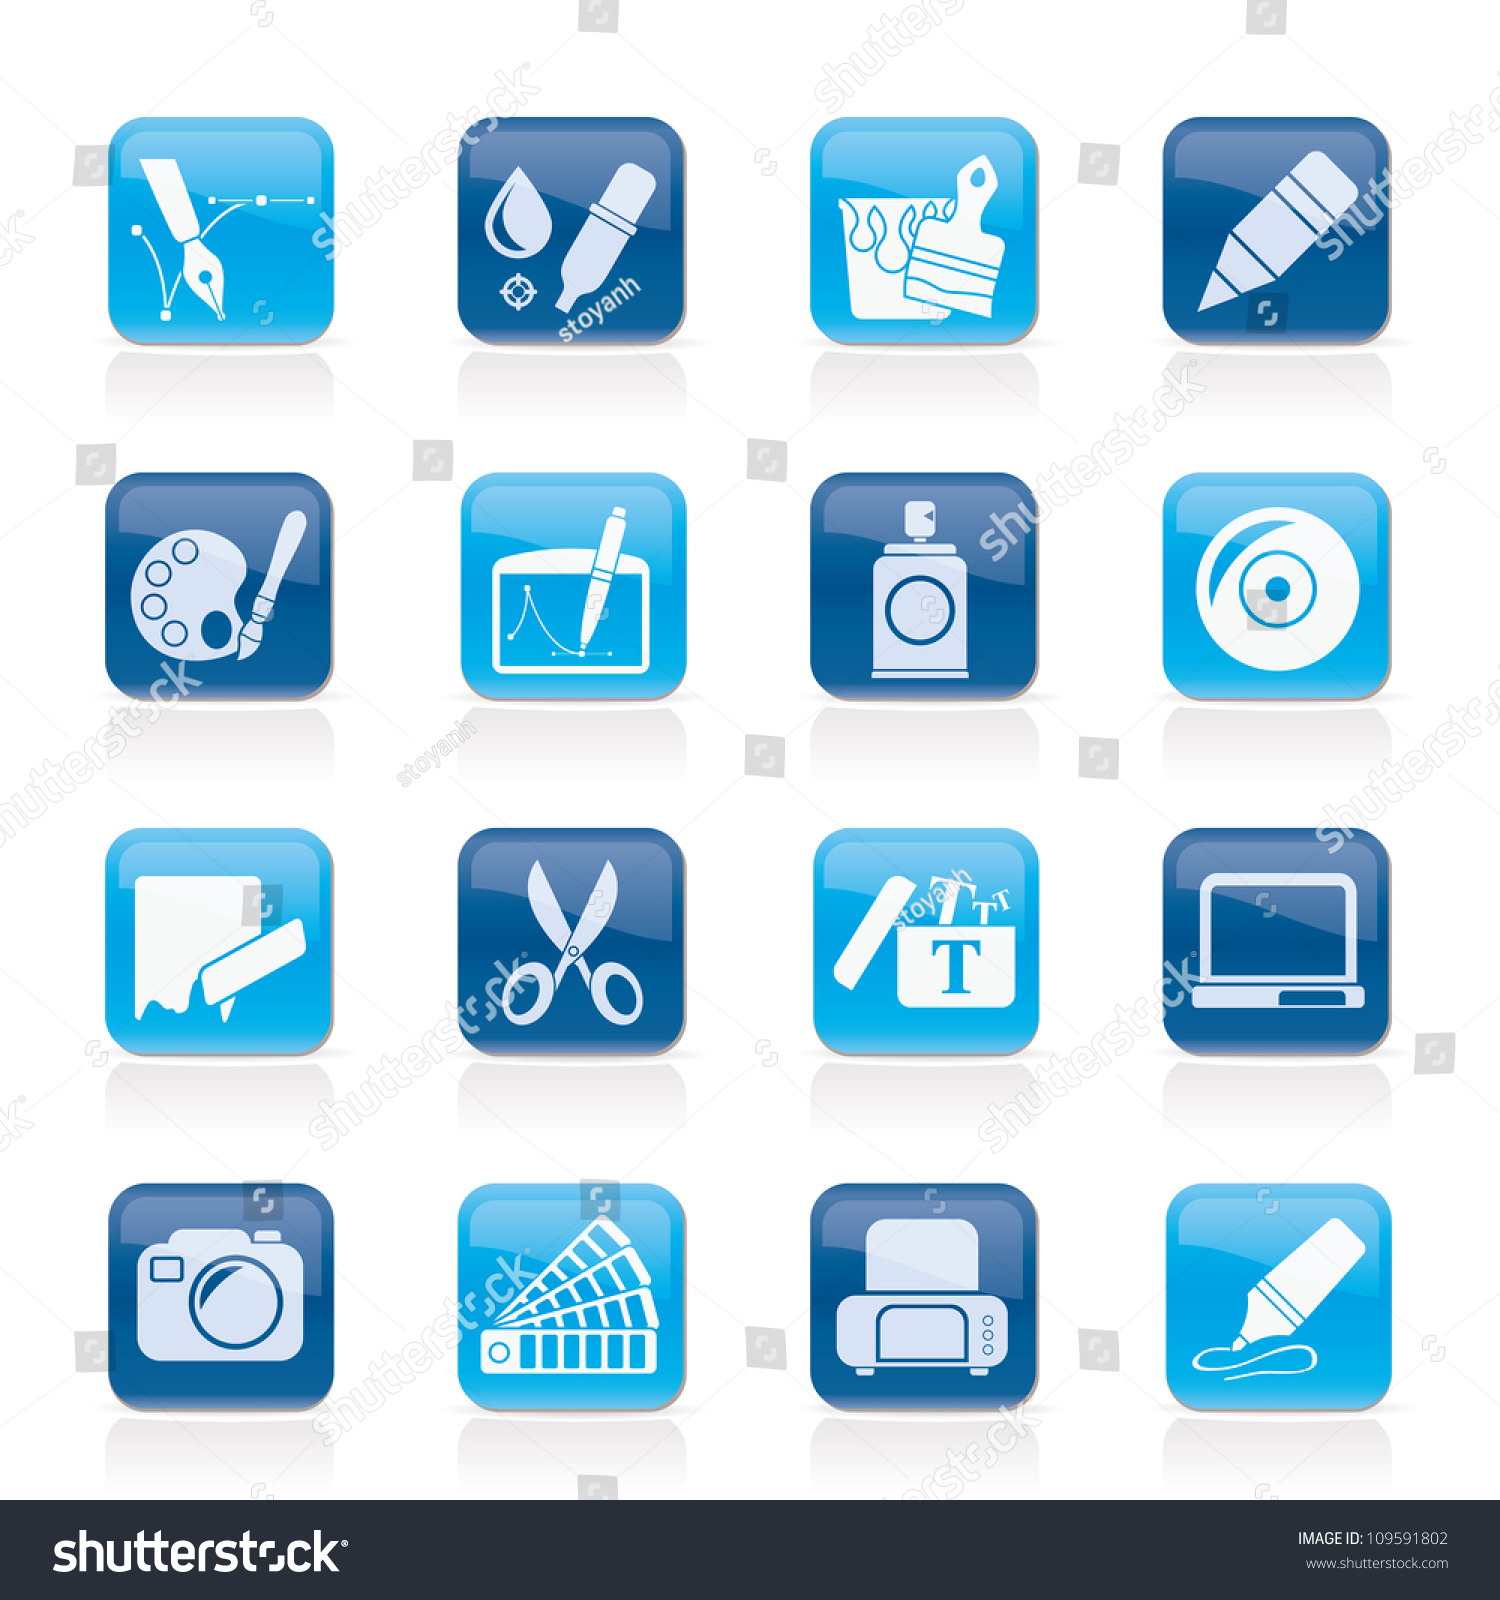 Graphic Web Design Icons Vector Icon Stock Vector 109591802 ...